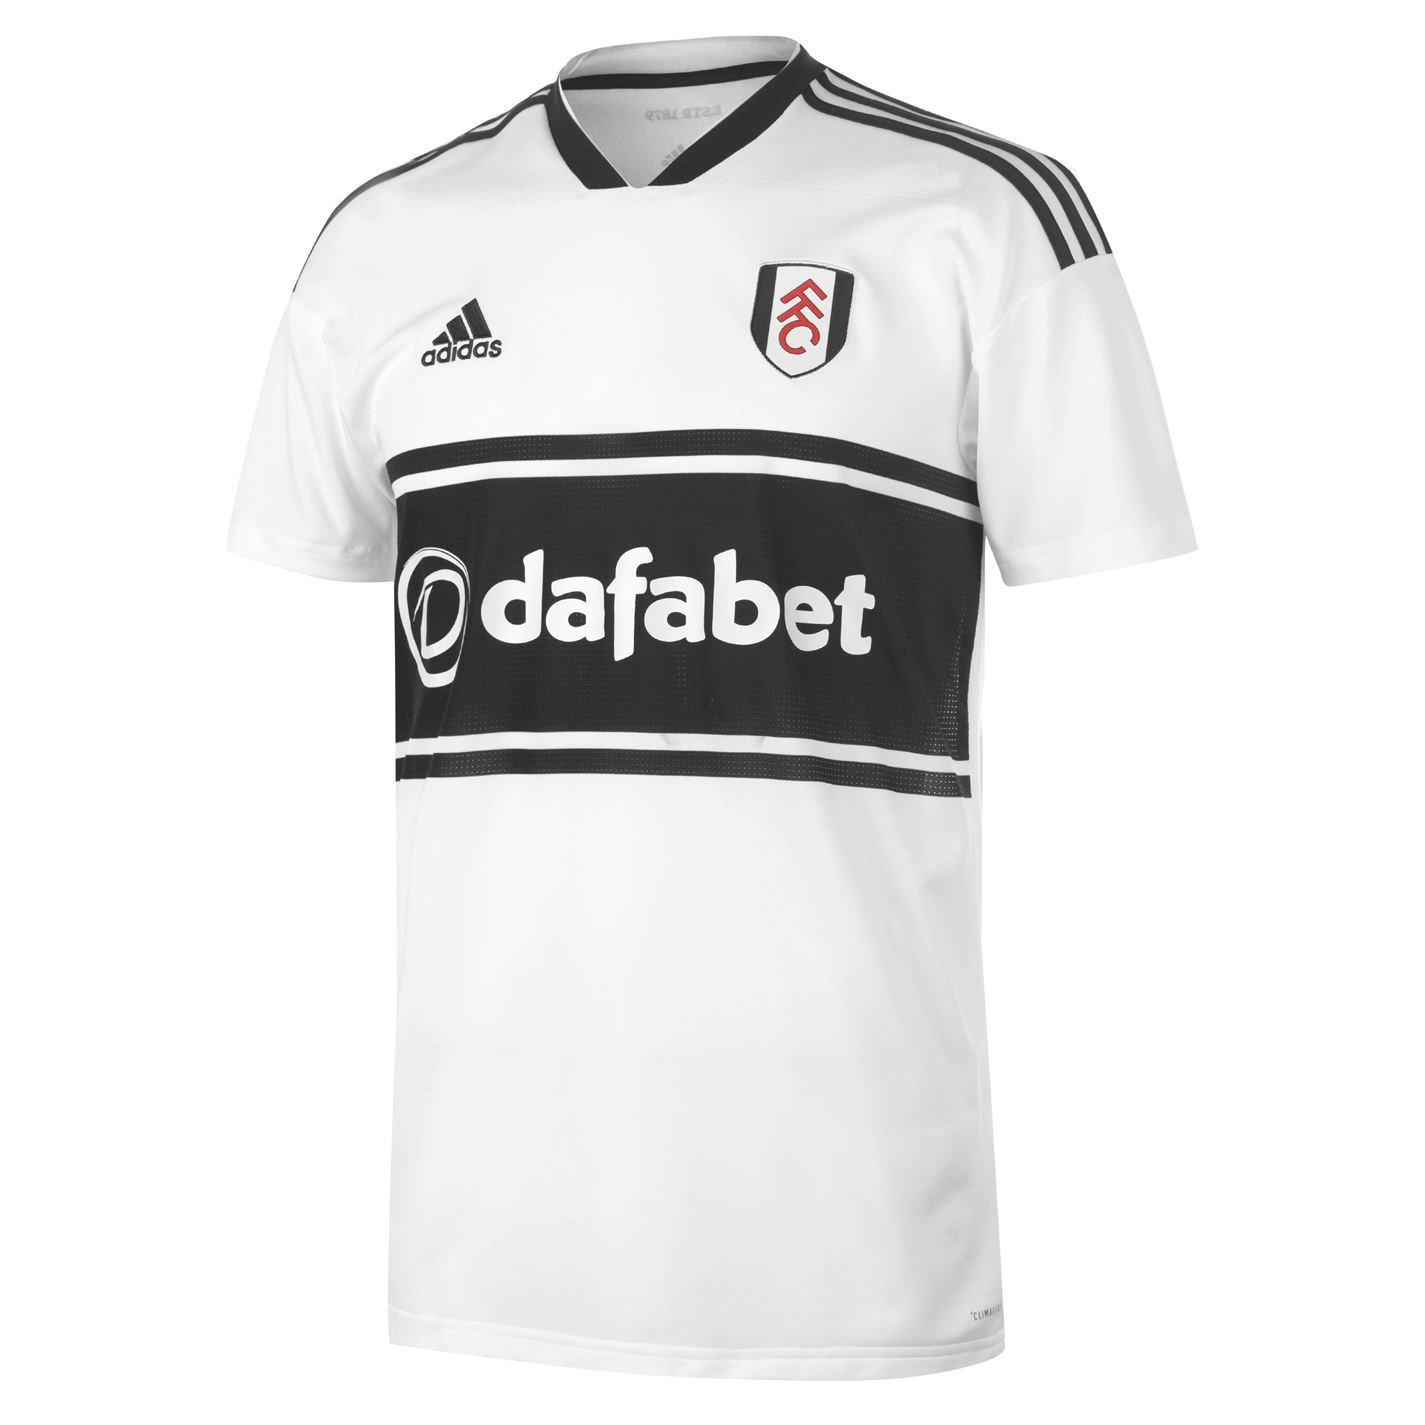 dd2a3139213 ... adidas Fulham Home Jersey 2018 2019 Mens White Football Soccer Fan Shirt  Top ...